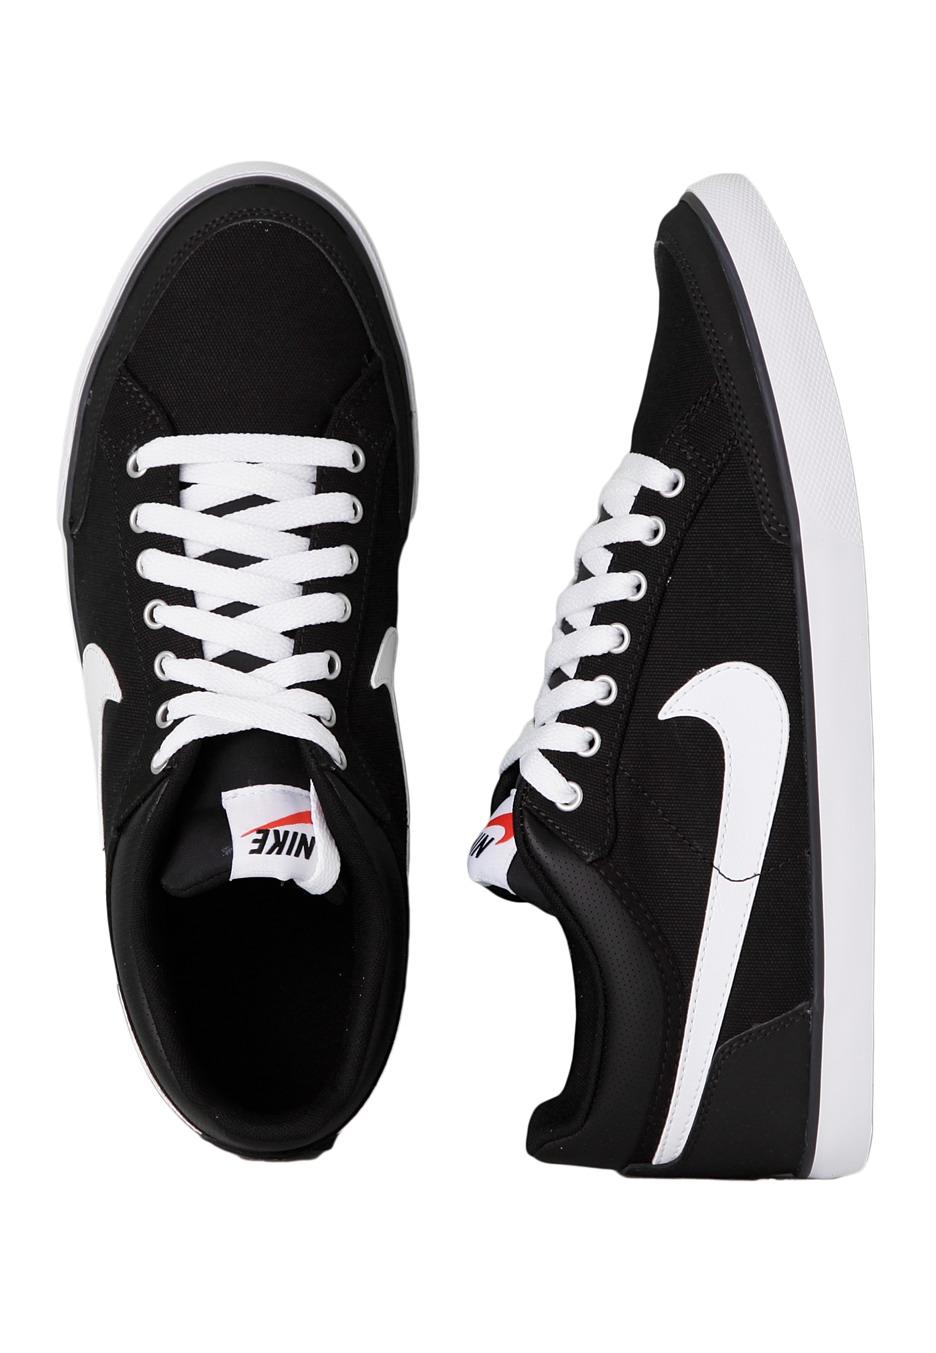 Nike - Capri III Low TXT Black White Anthracite - Shoes - Impericon.com UK 8bd09b62f